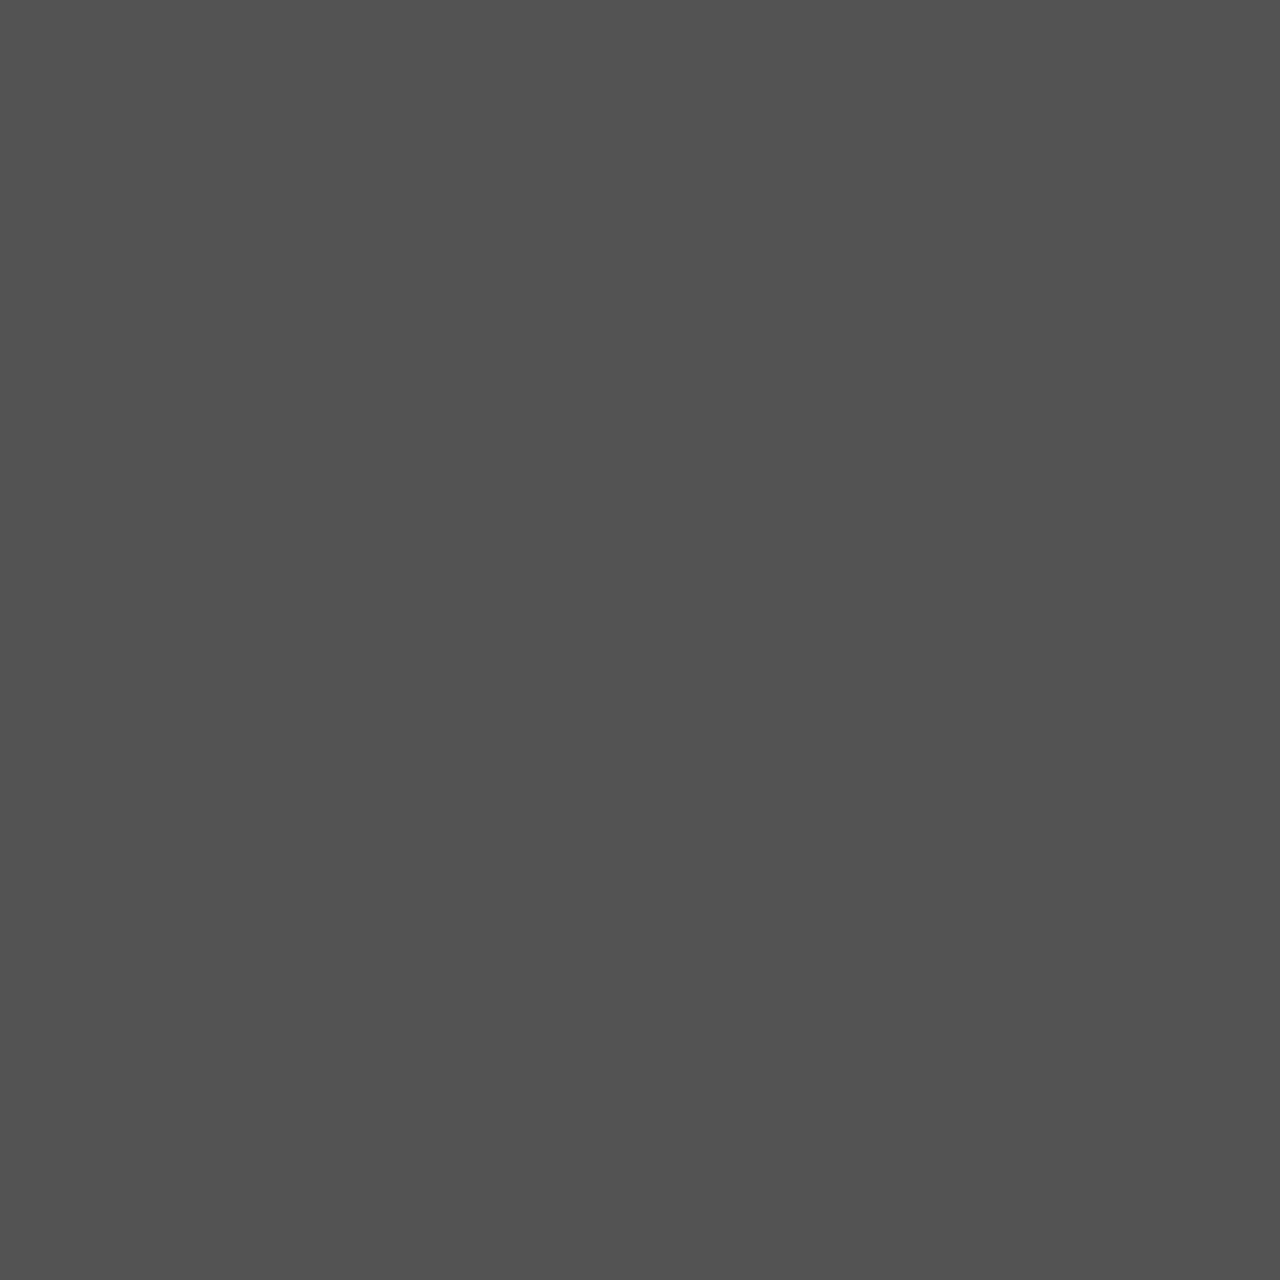 T70.0.0 Slate Grey